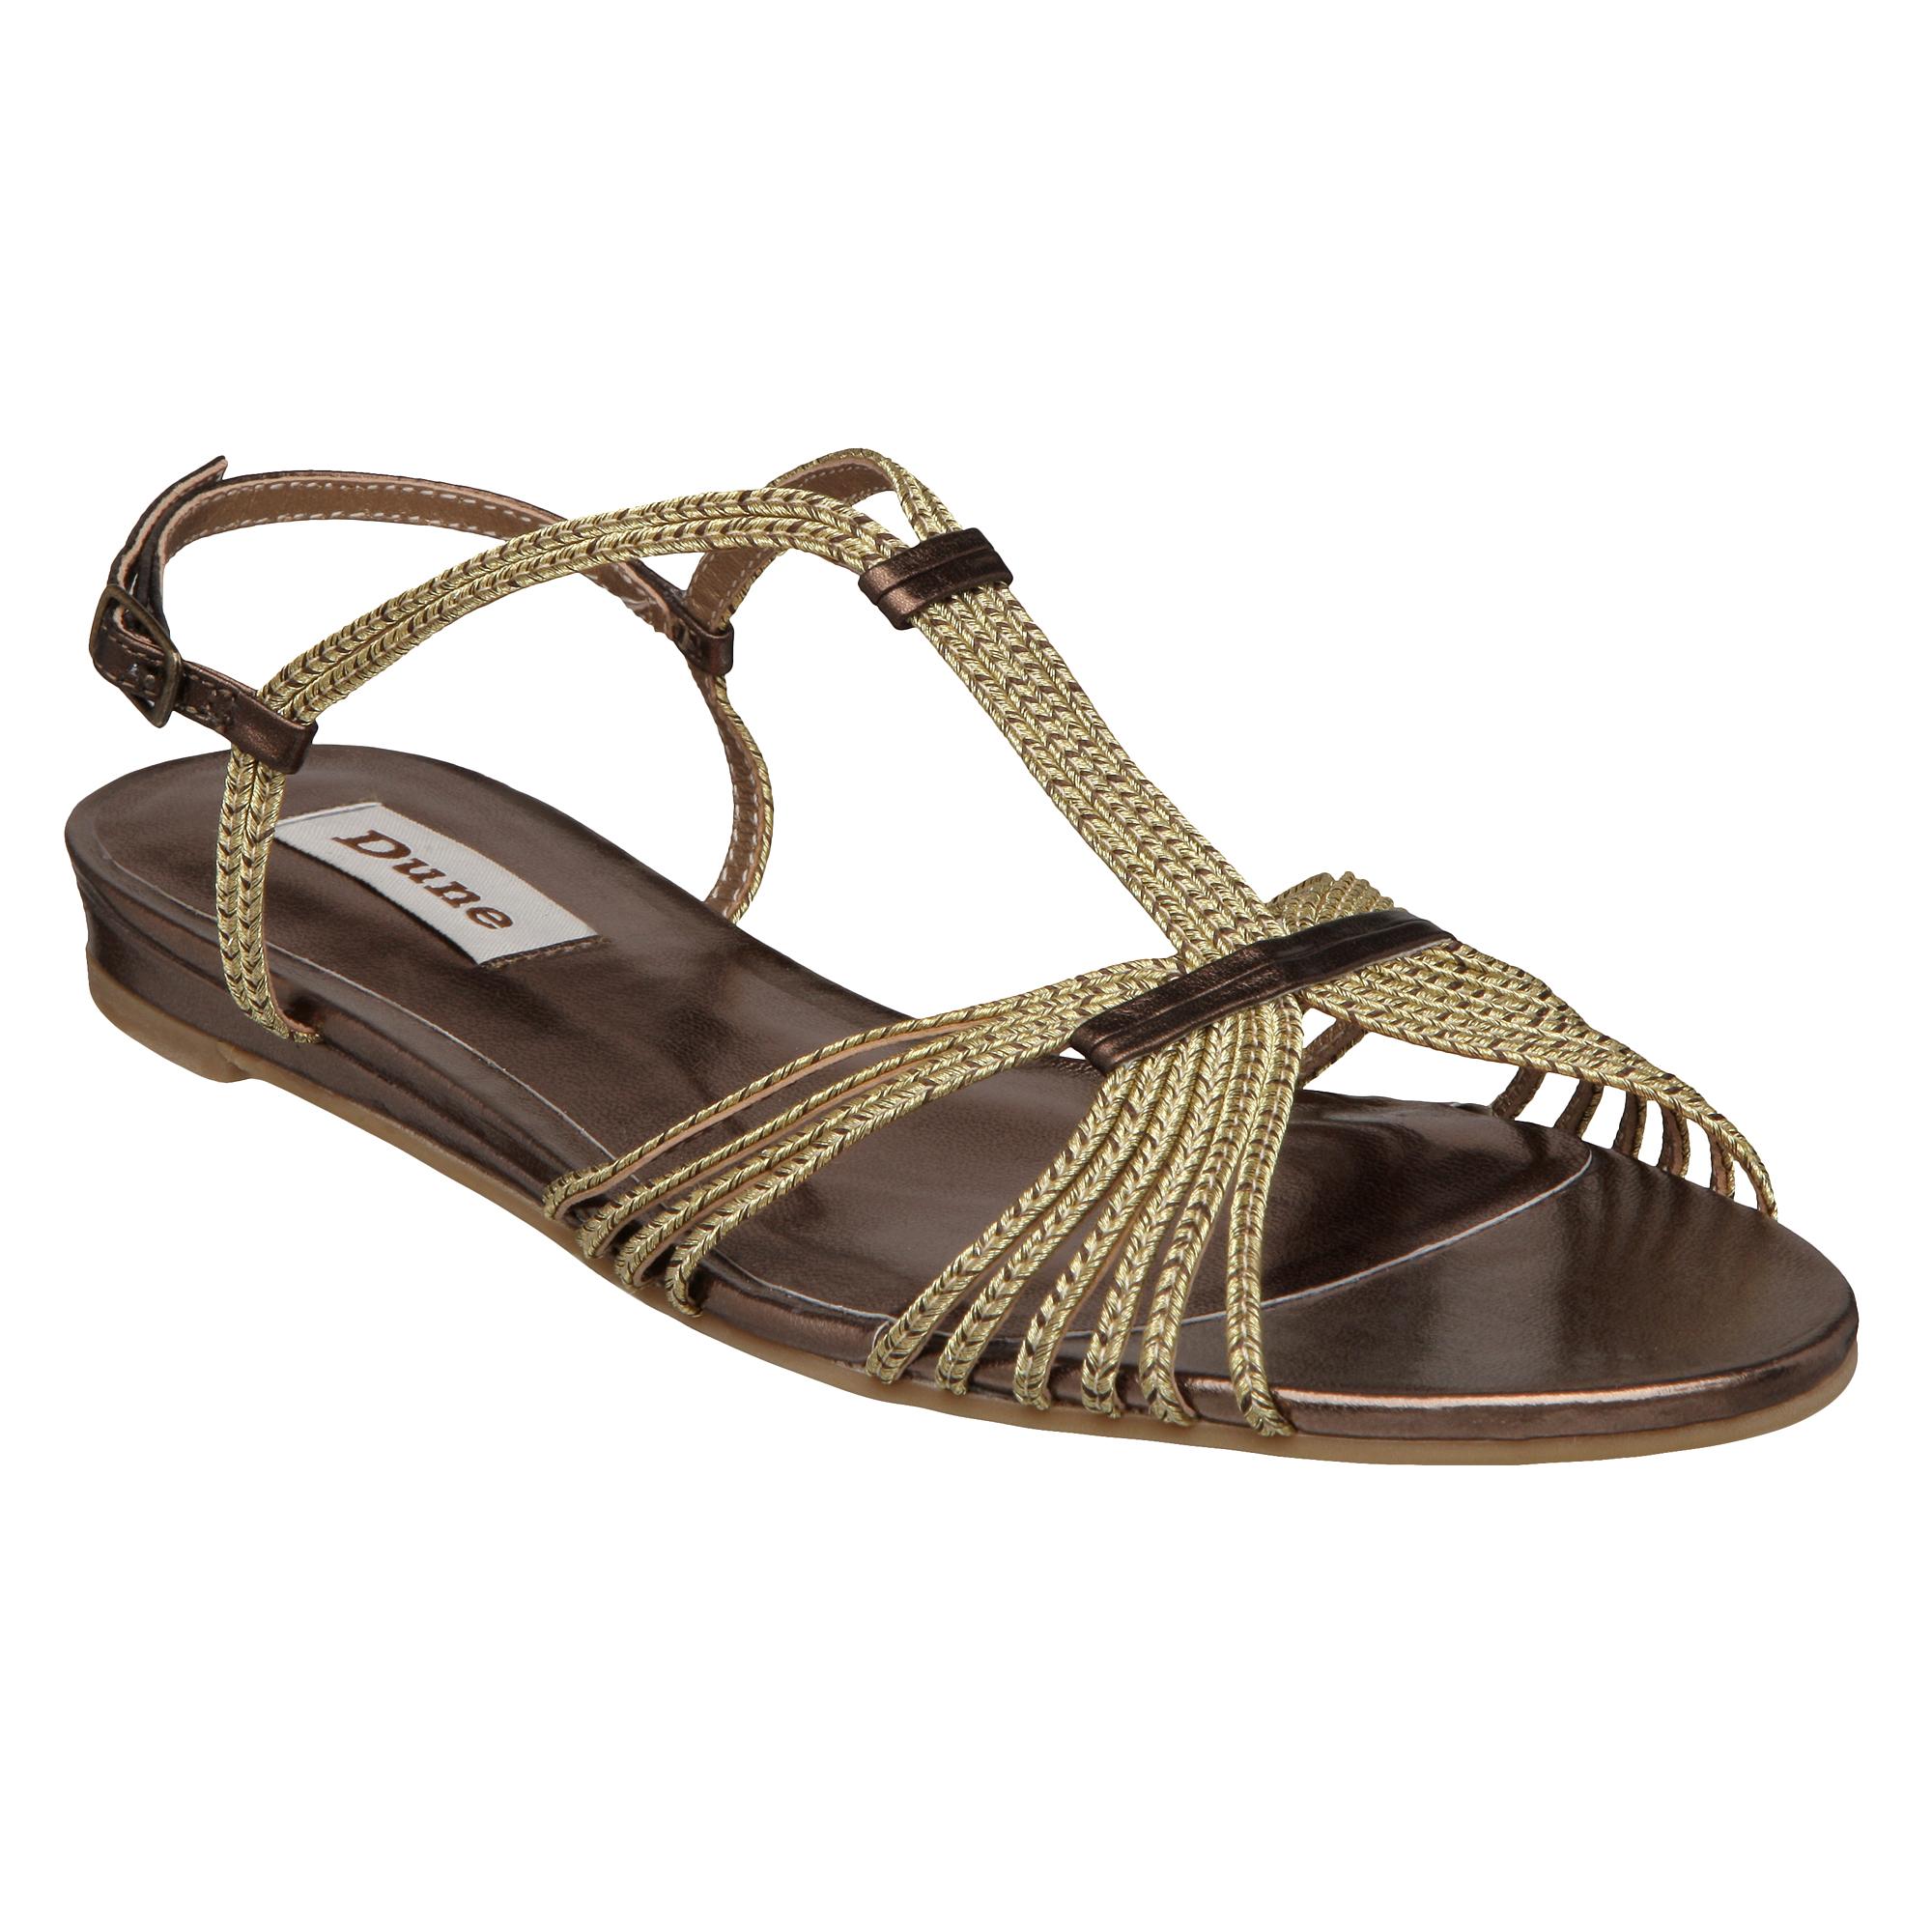 Womens sandals uk - New Head Over Heals Womens J Clara Ladies